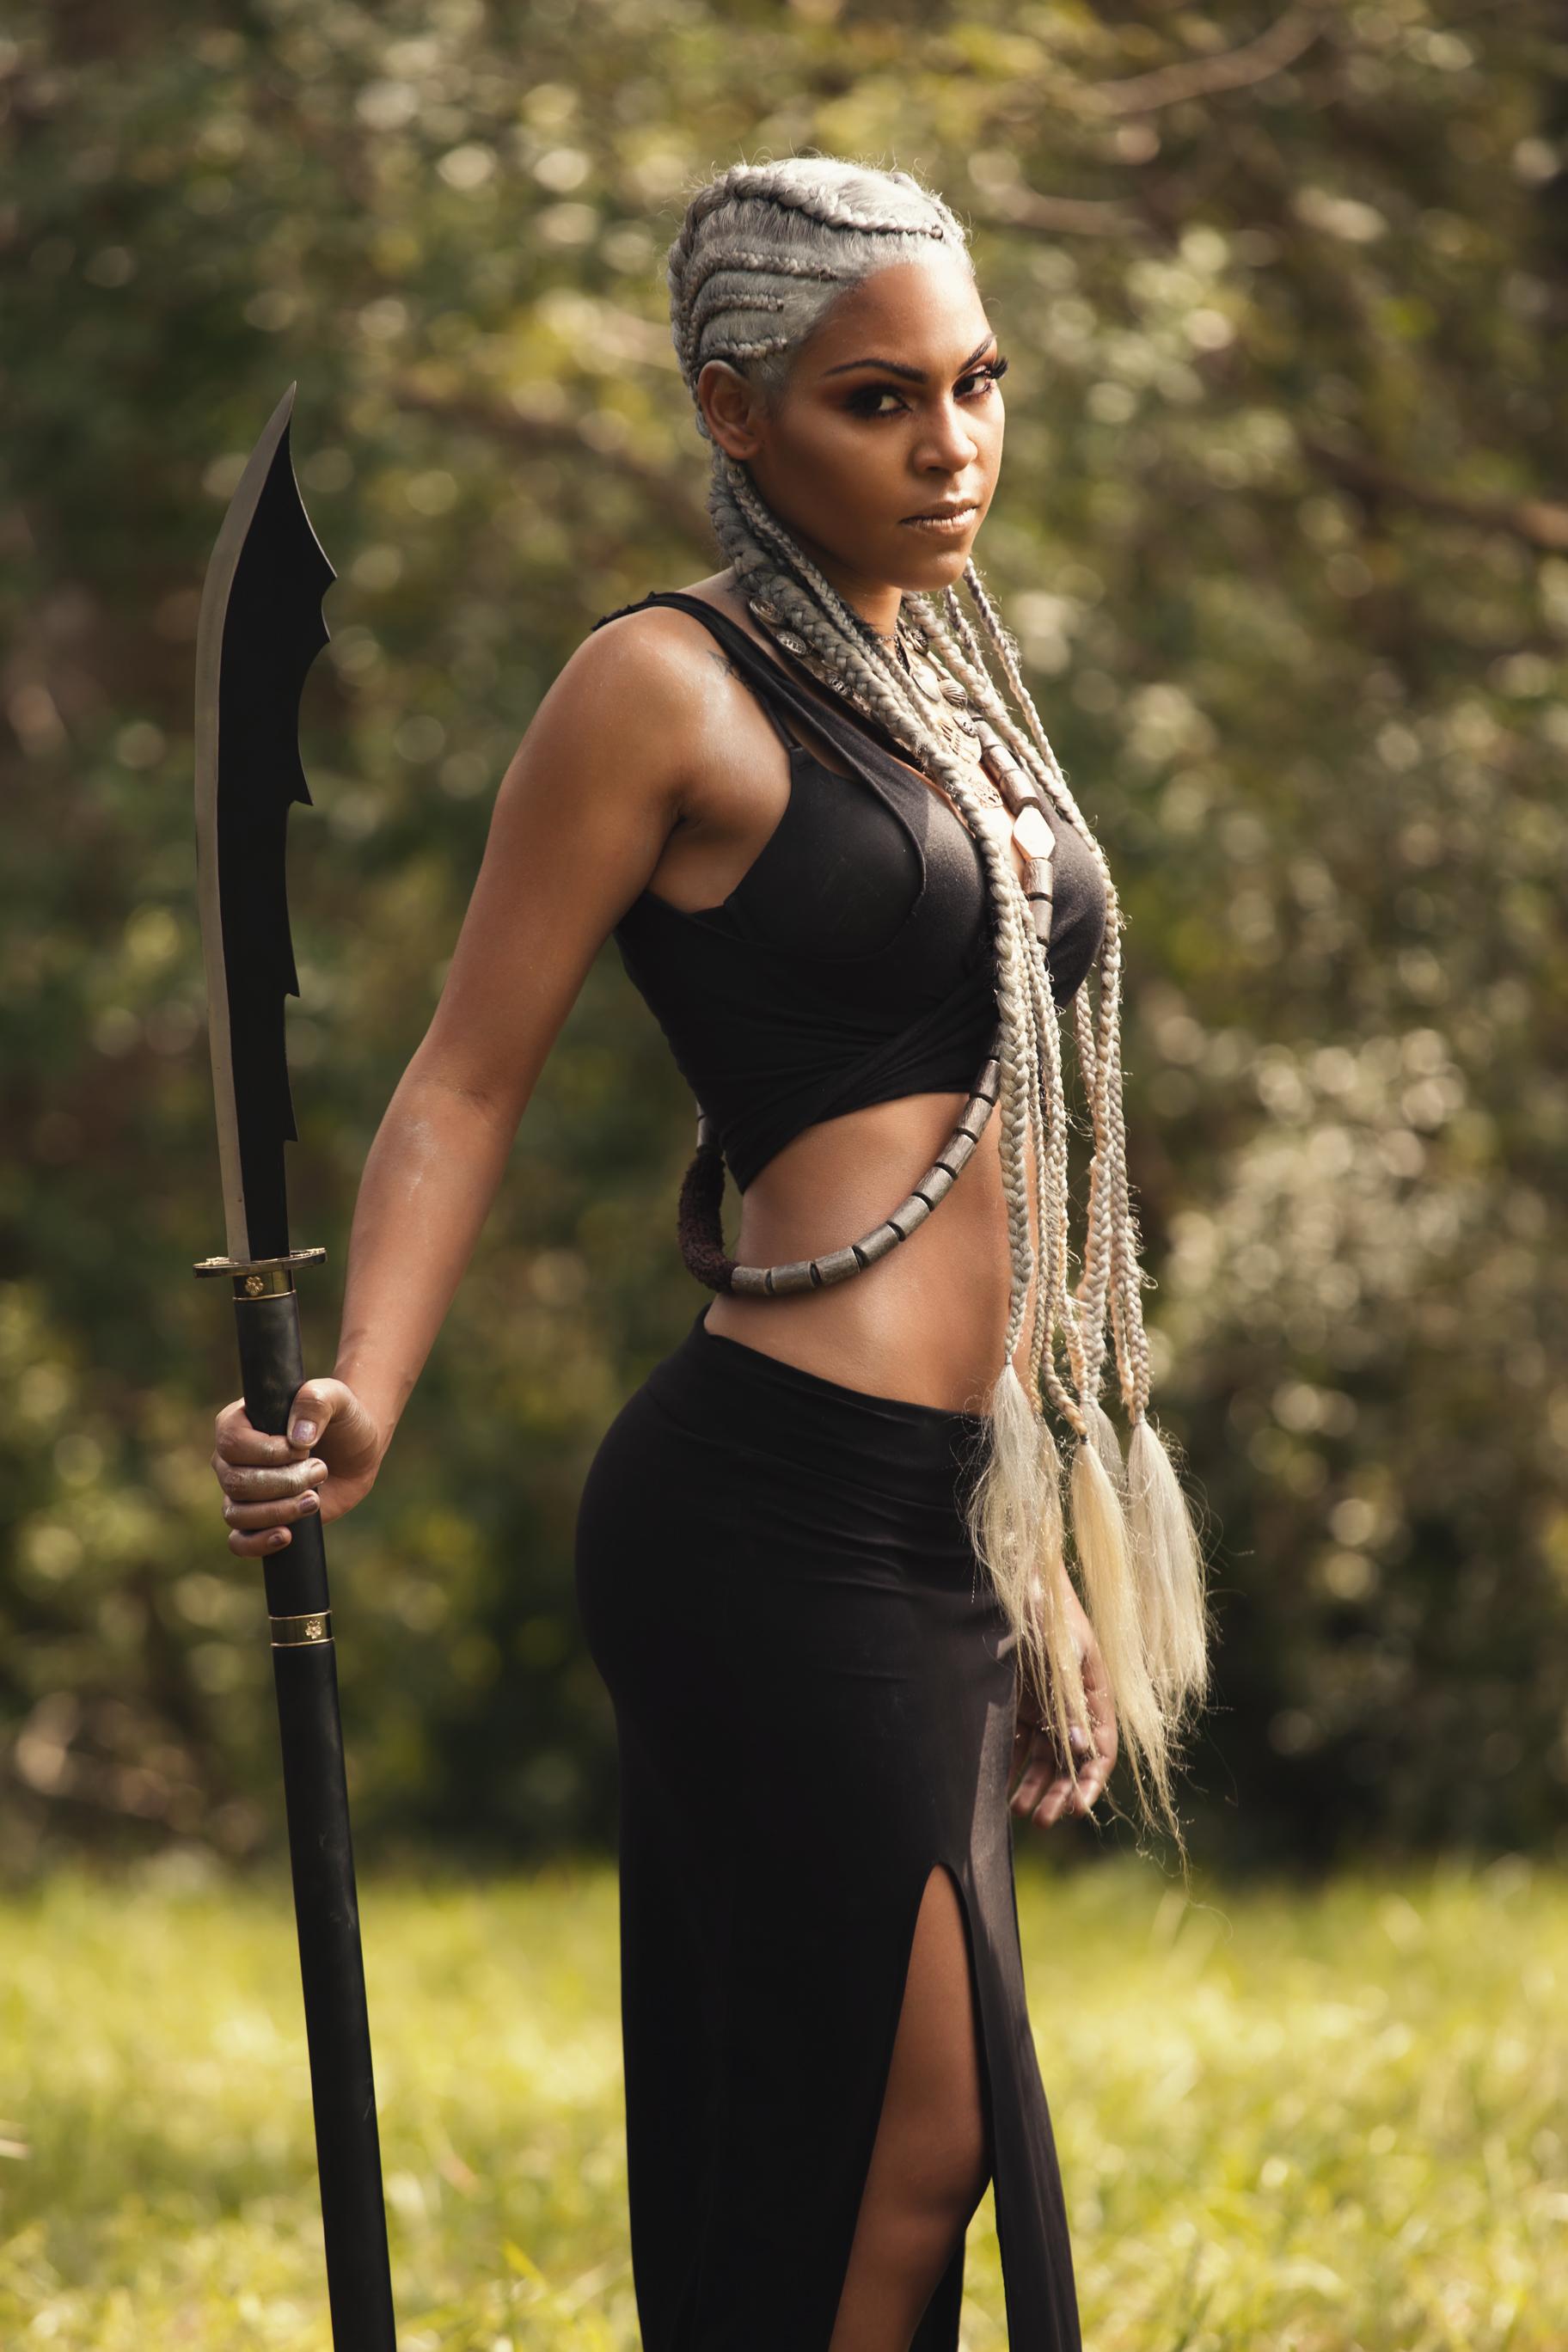 character-chamber-photography-warrior-female15.jpg